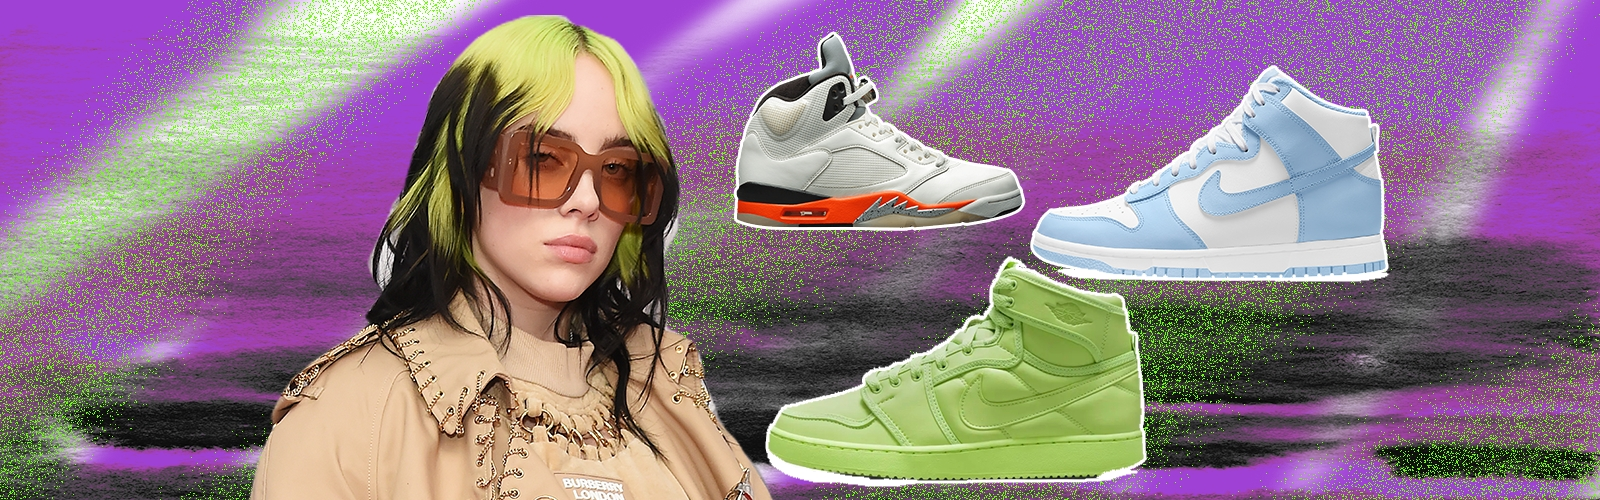 Billie-Shoe_TF.jpg